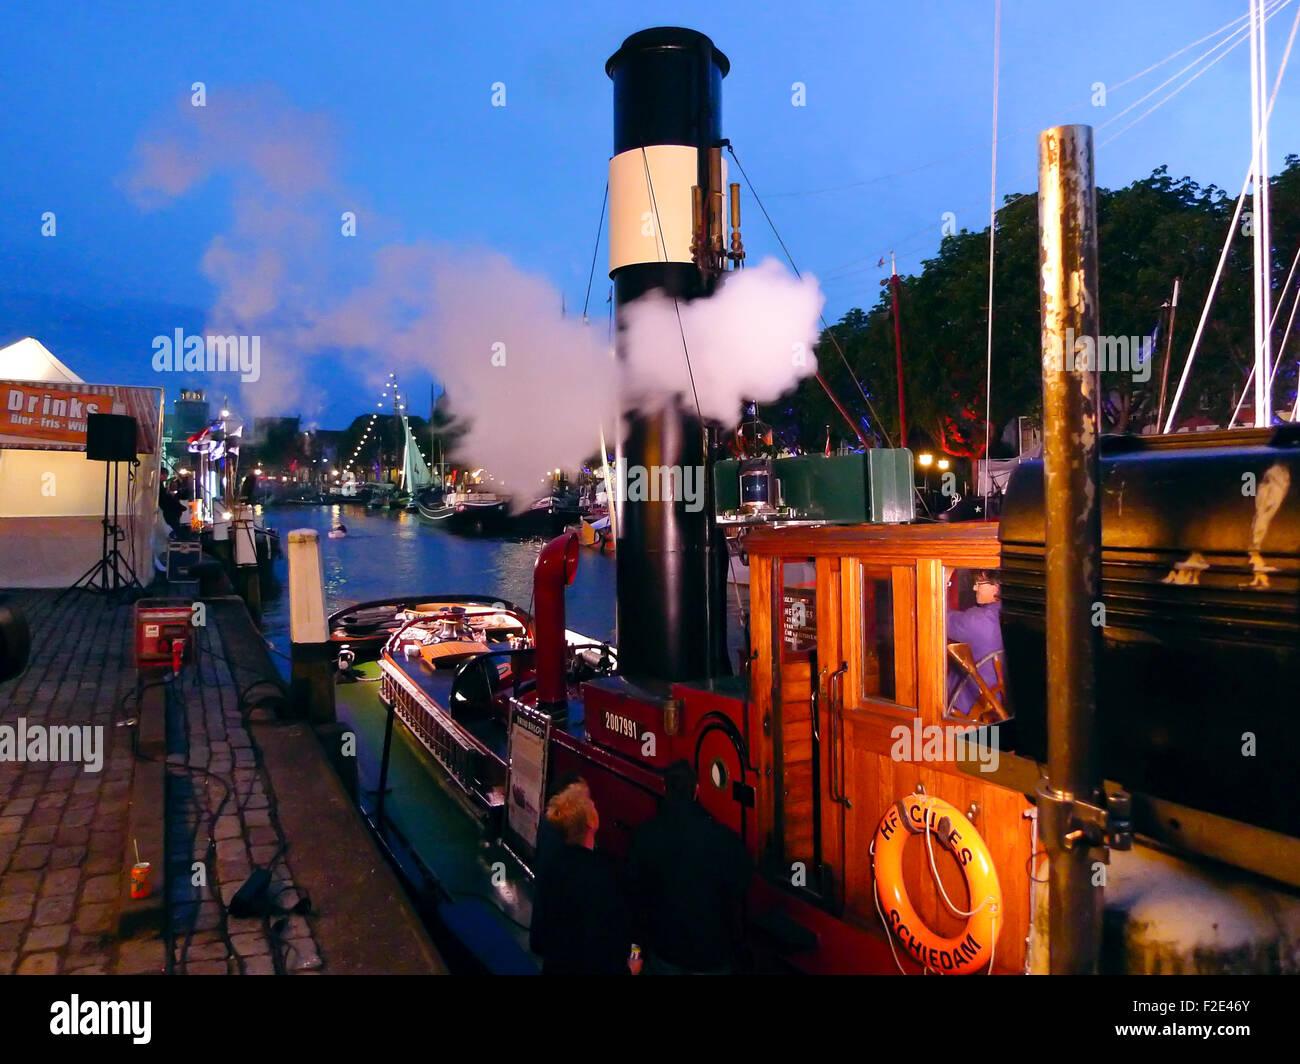 DORDRECHT, NETHERLANDS - JUNE 2 2012: Dordrecht in Steam, the largest steam power event in Europe. Steamboat Hercules - Stock Image